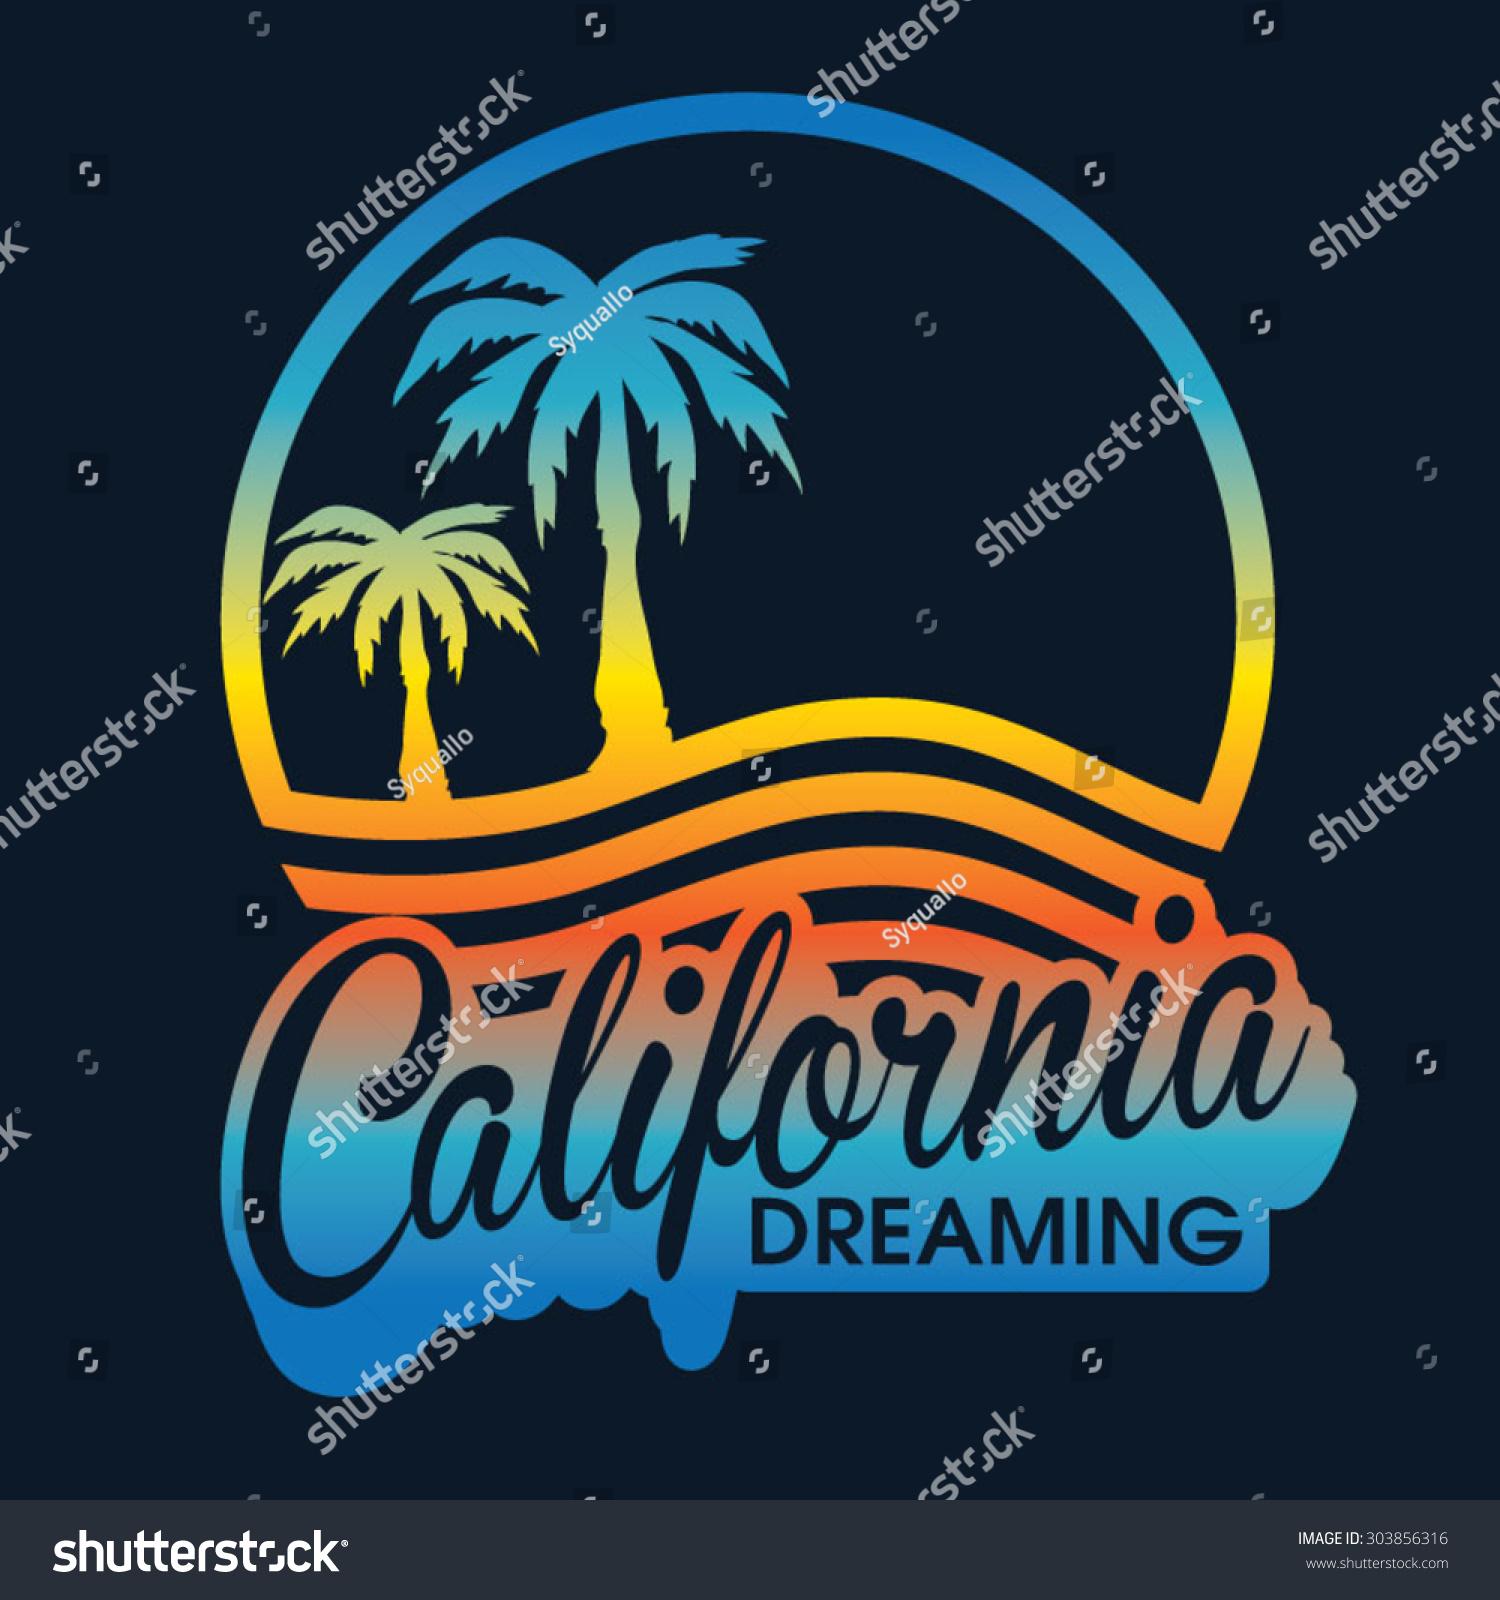 California Dreaming Surf Typography Tshirt Graphics Stock ...